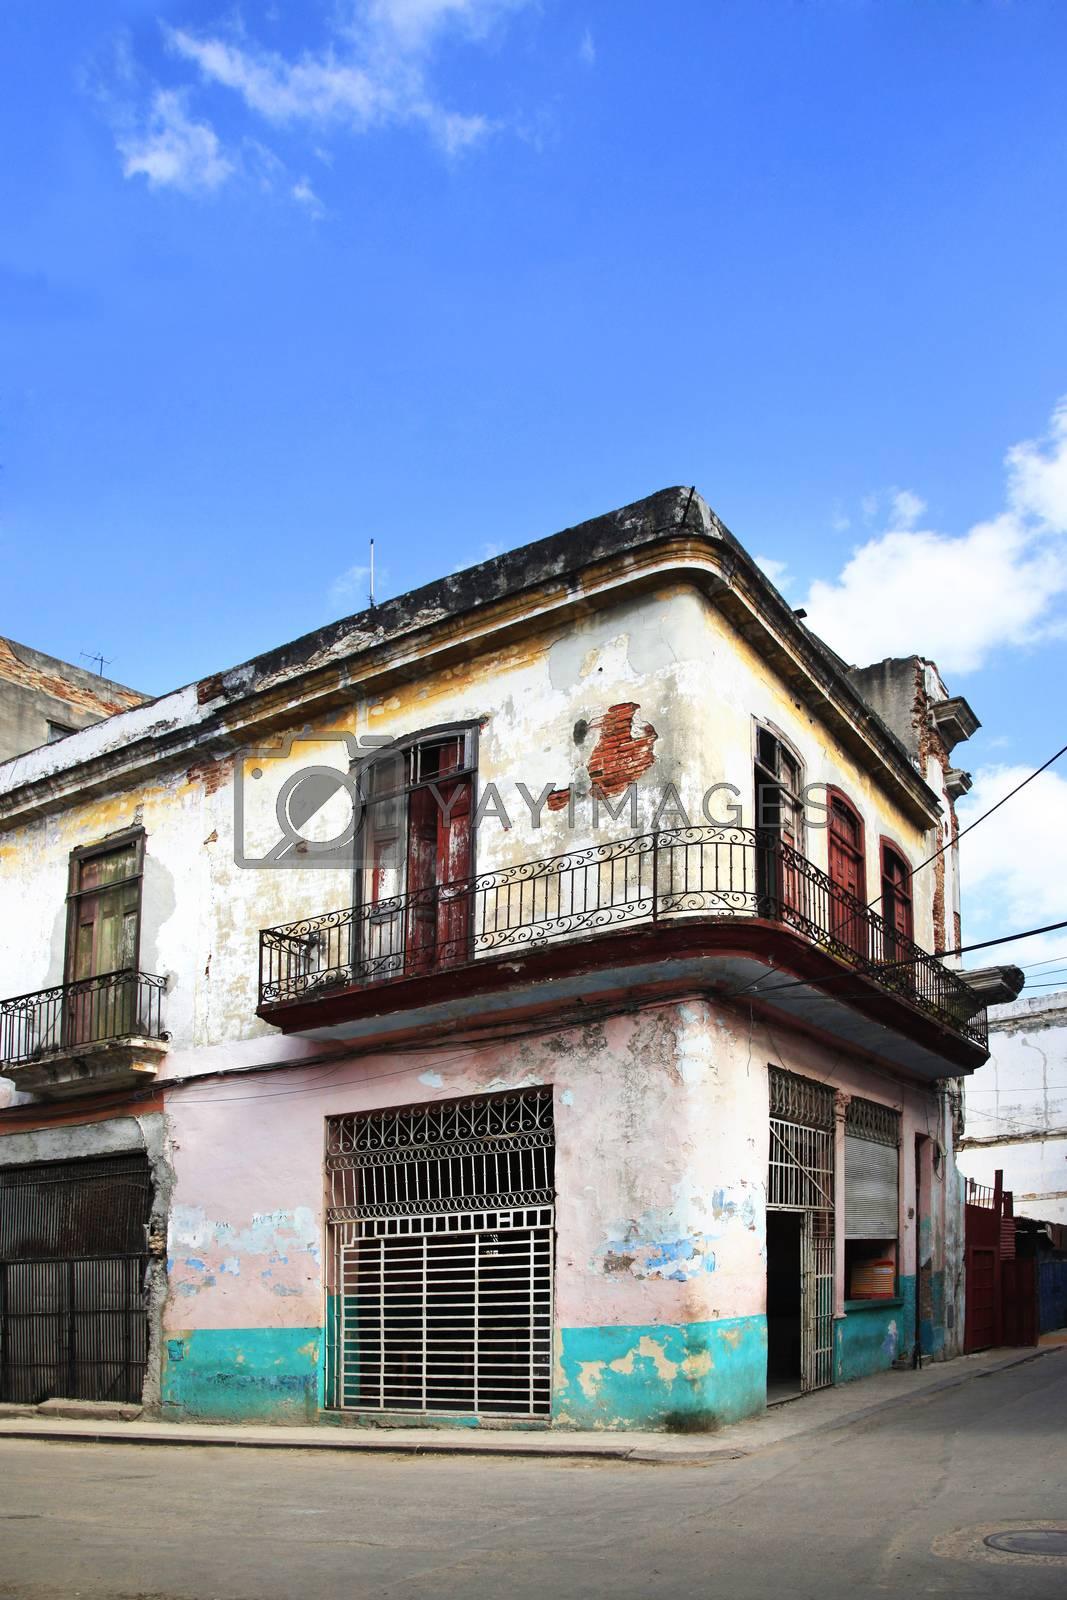 facade of an old building in Old Havana, Cuba